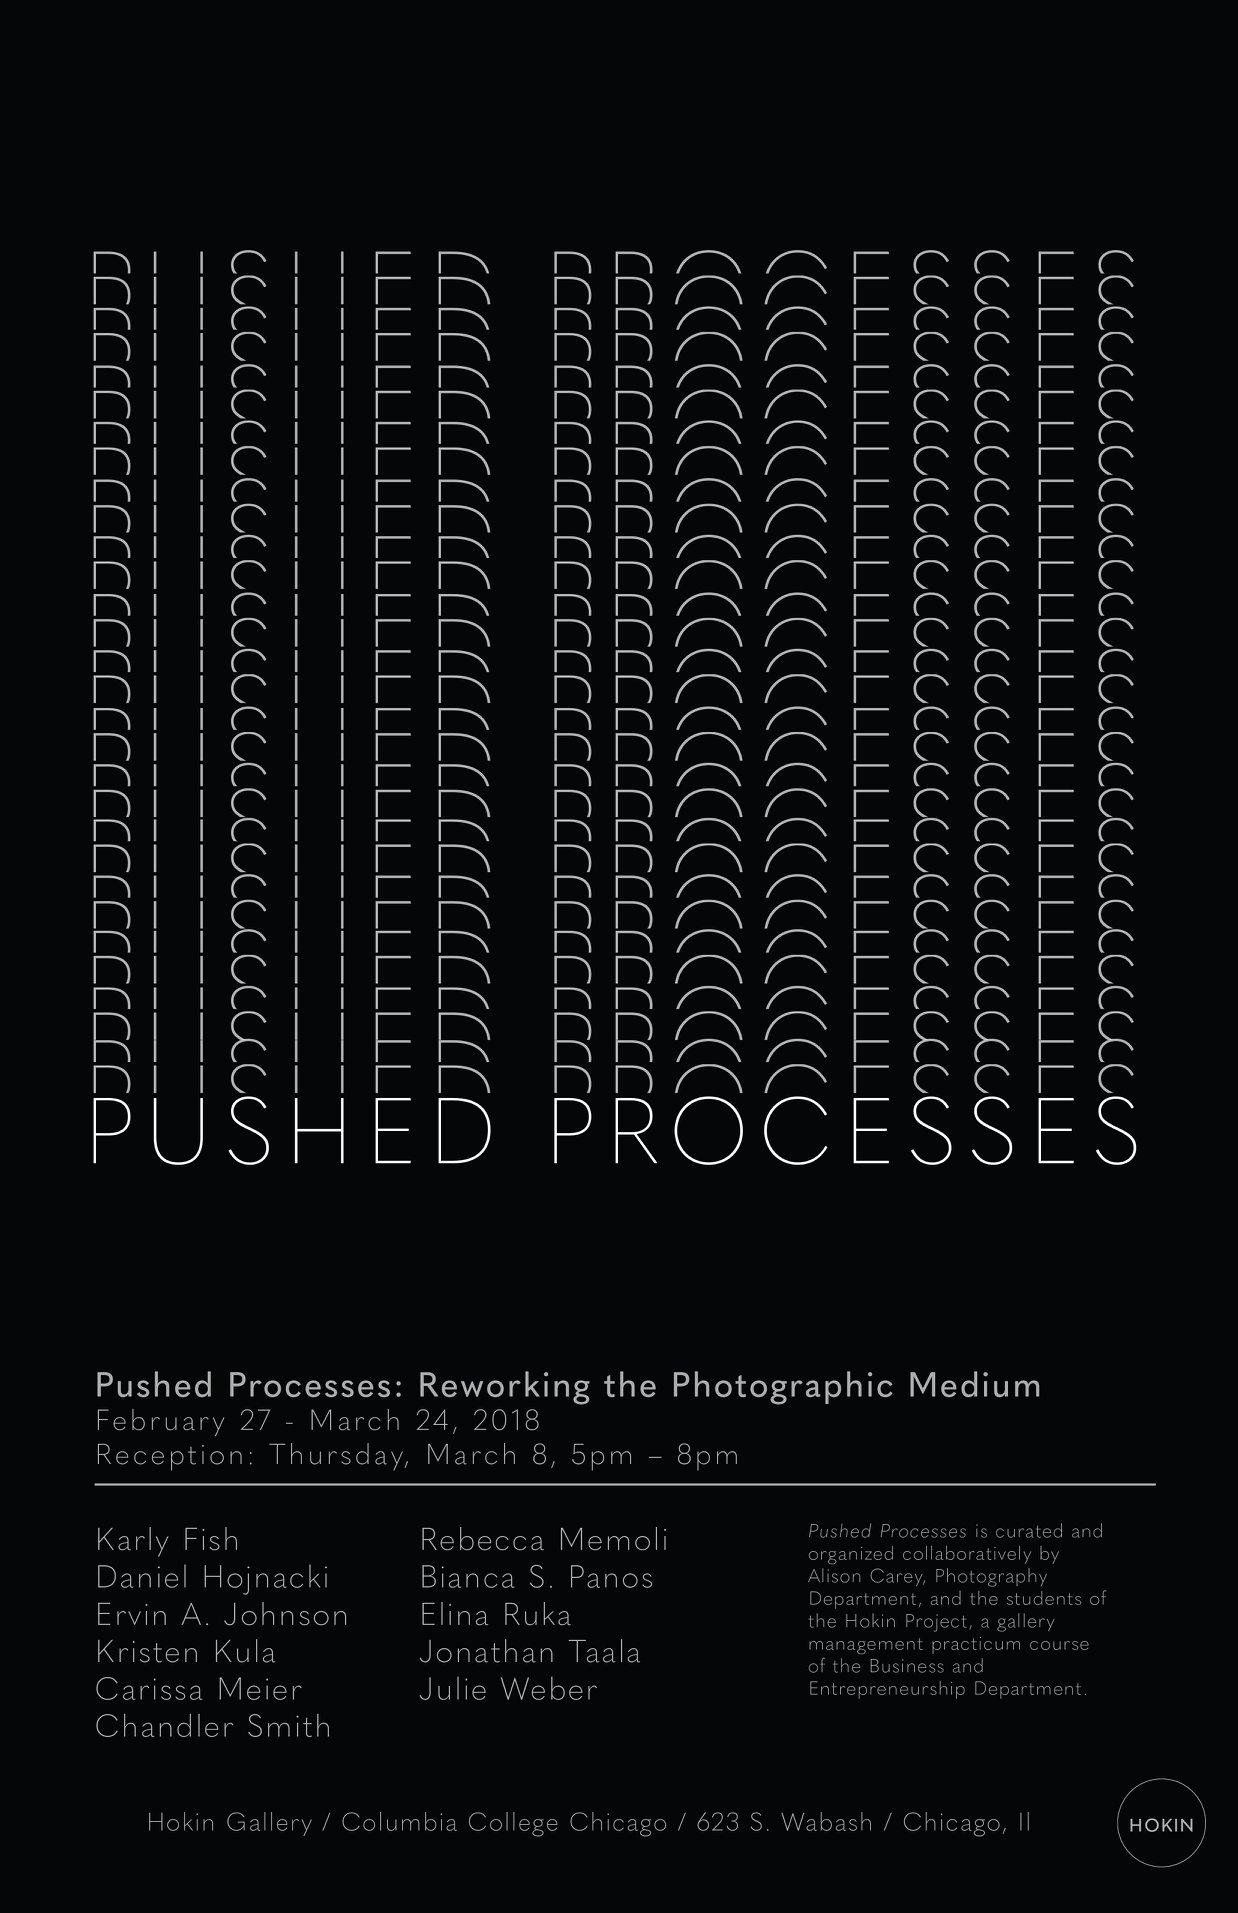 PushedProcesses.jpg